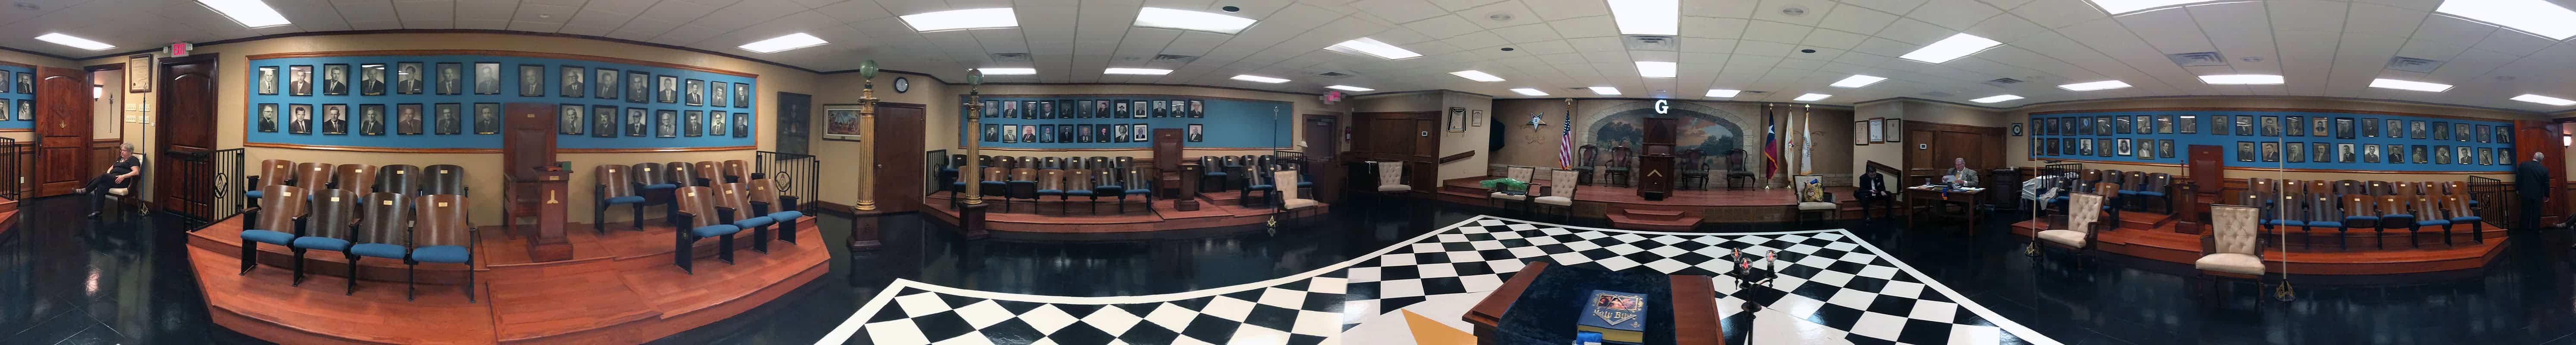 New Braunfels Masonic Center 2014